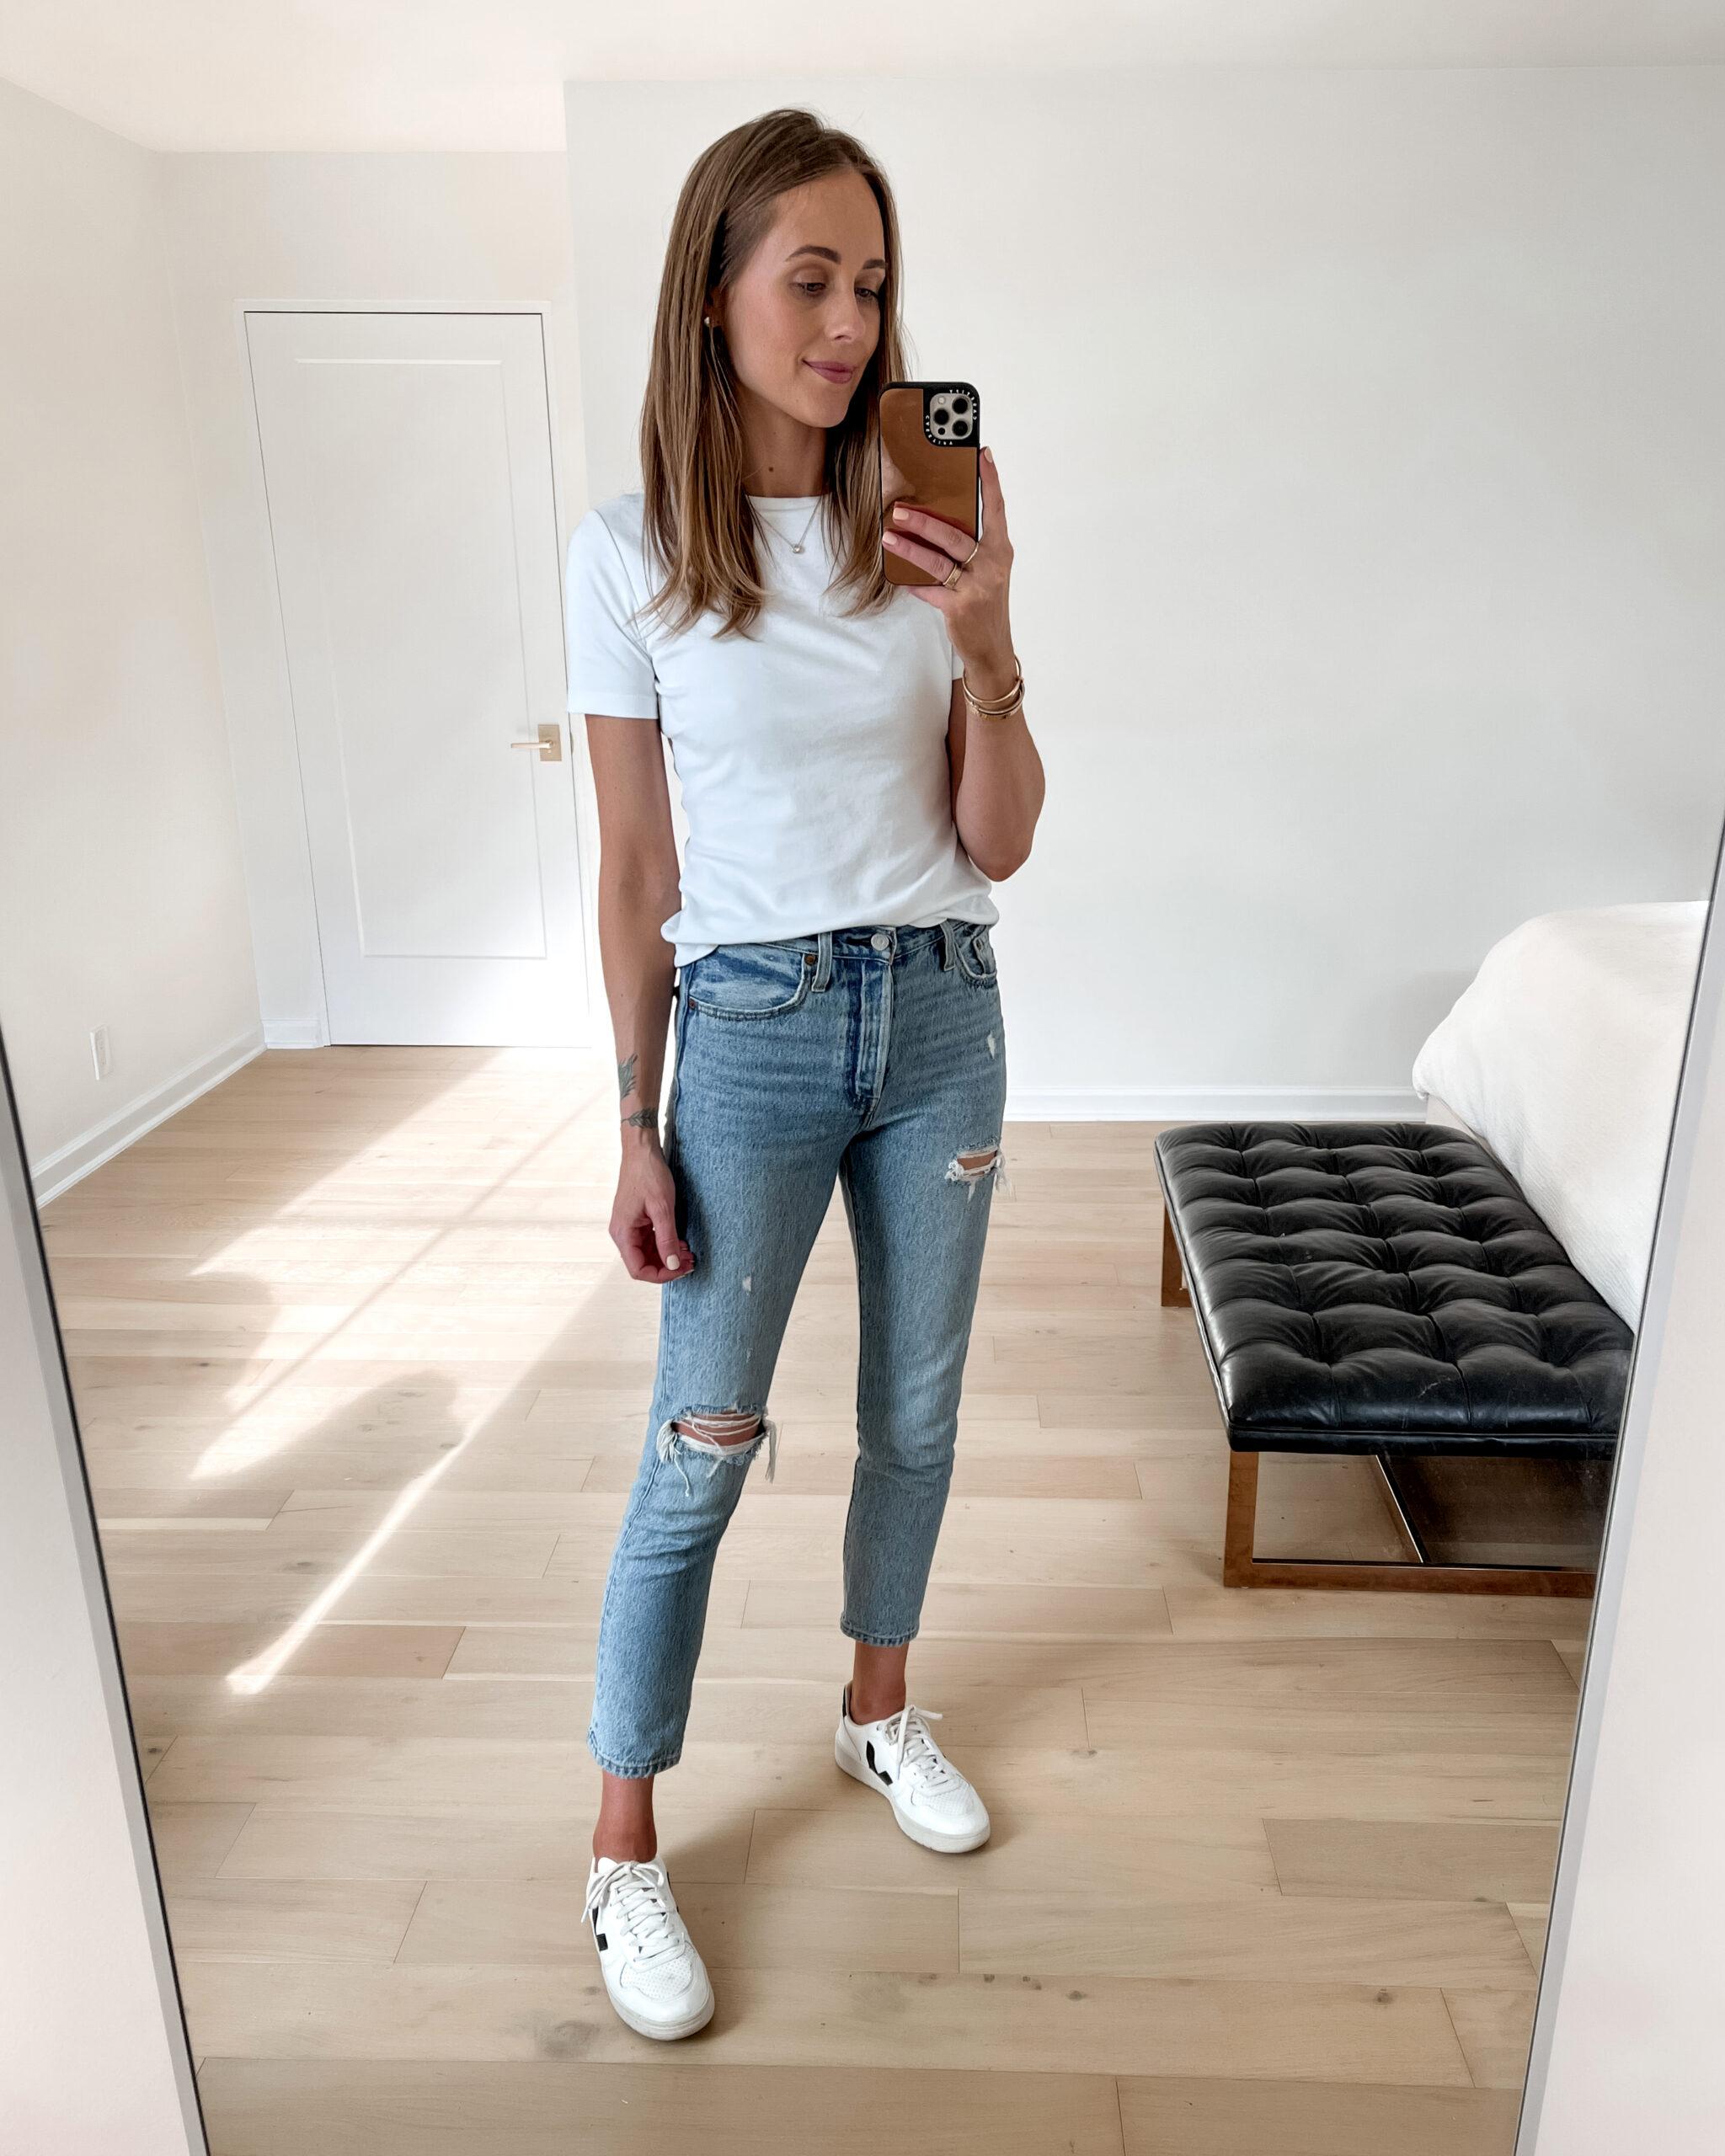 Fashion Jackson Amazon Fashion Made For You Fitted White Crewneck Tshirt